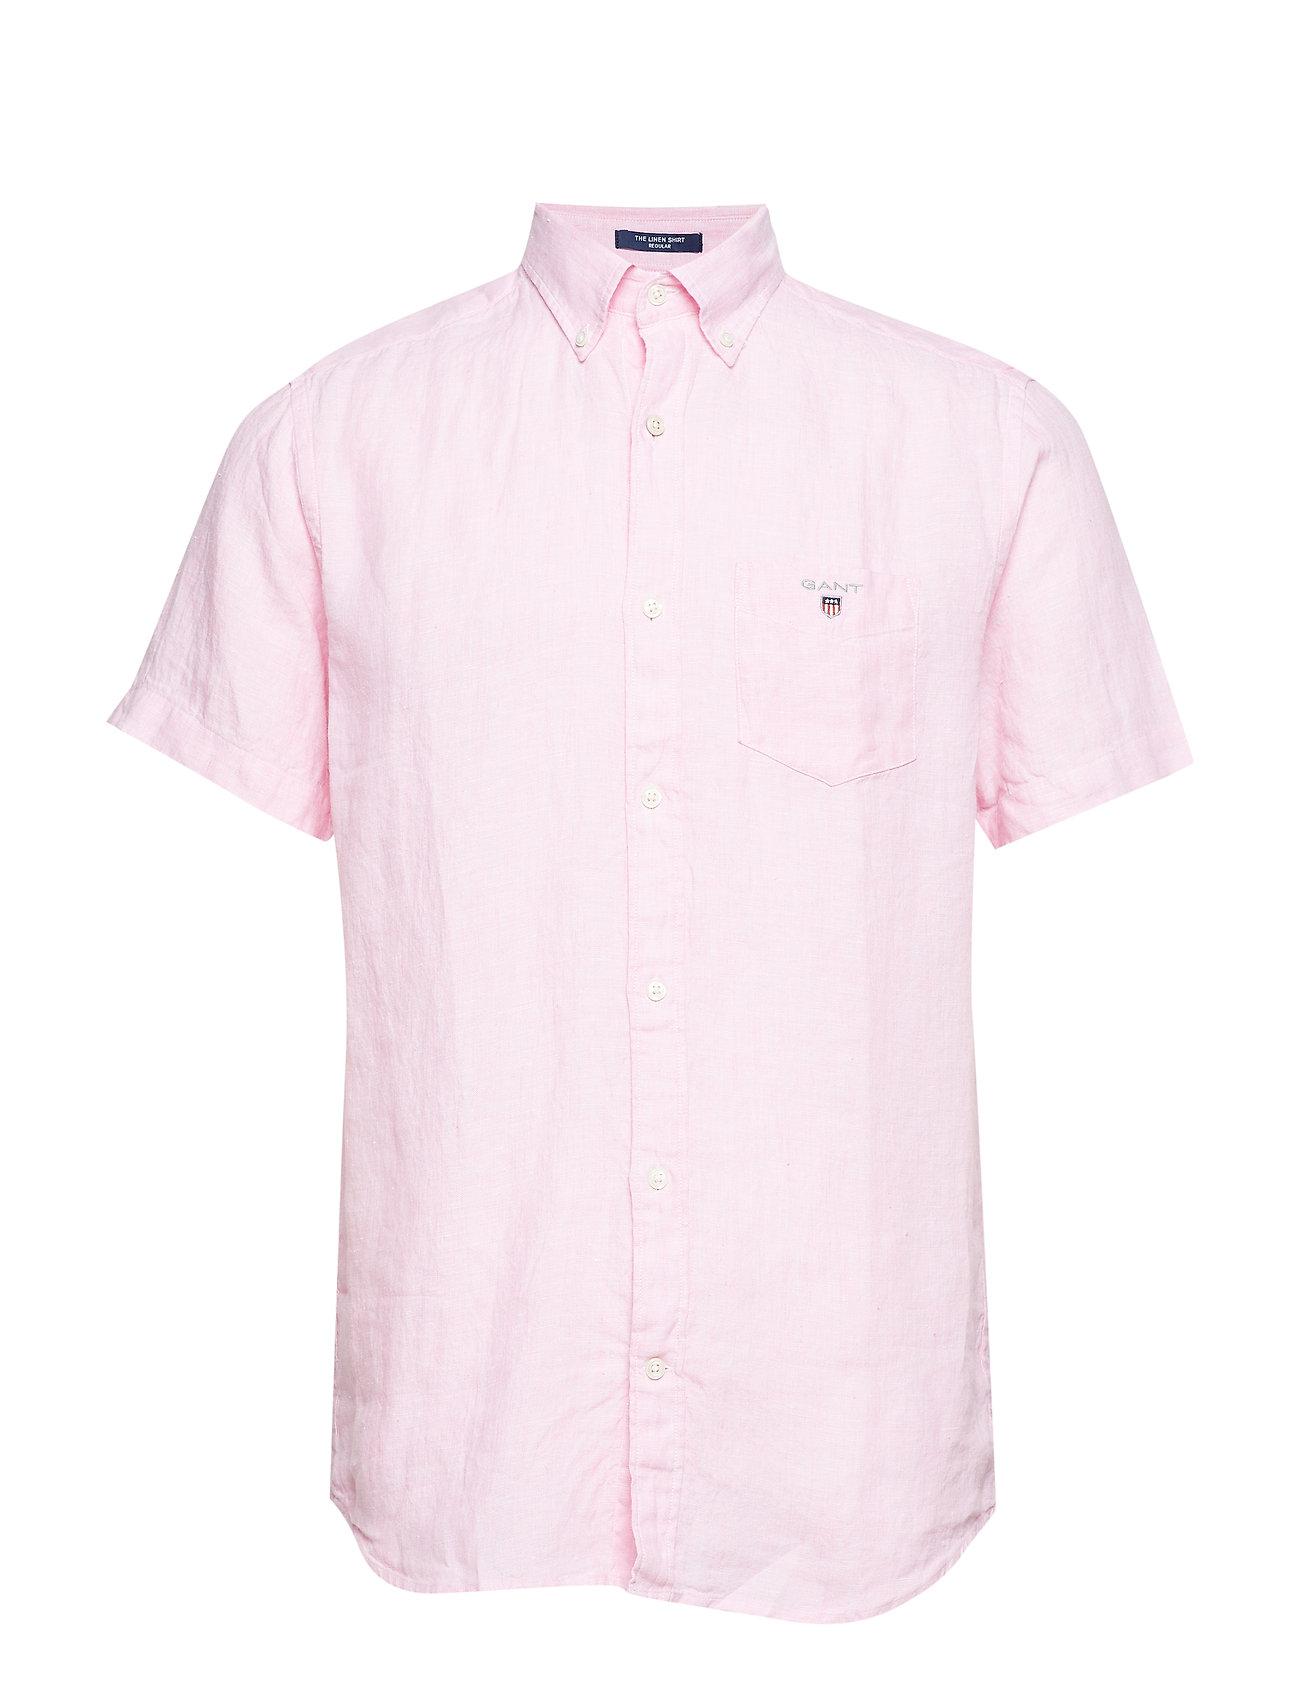 Bdbright Linen PinkGant Shirt The Ss Reg ulc513TFKJ